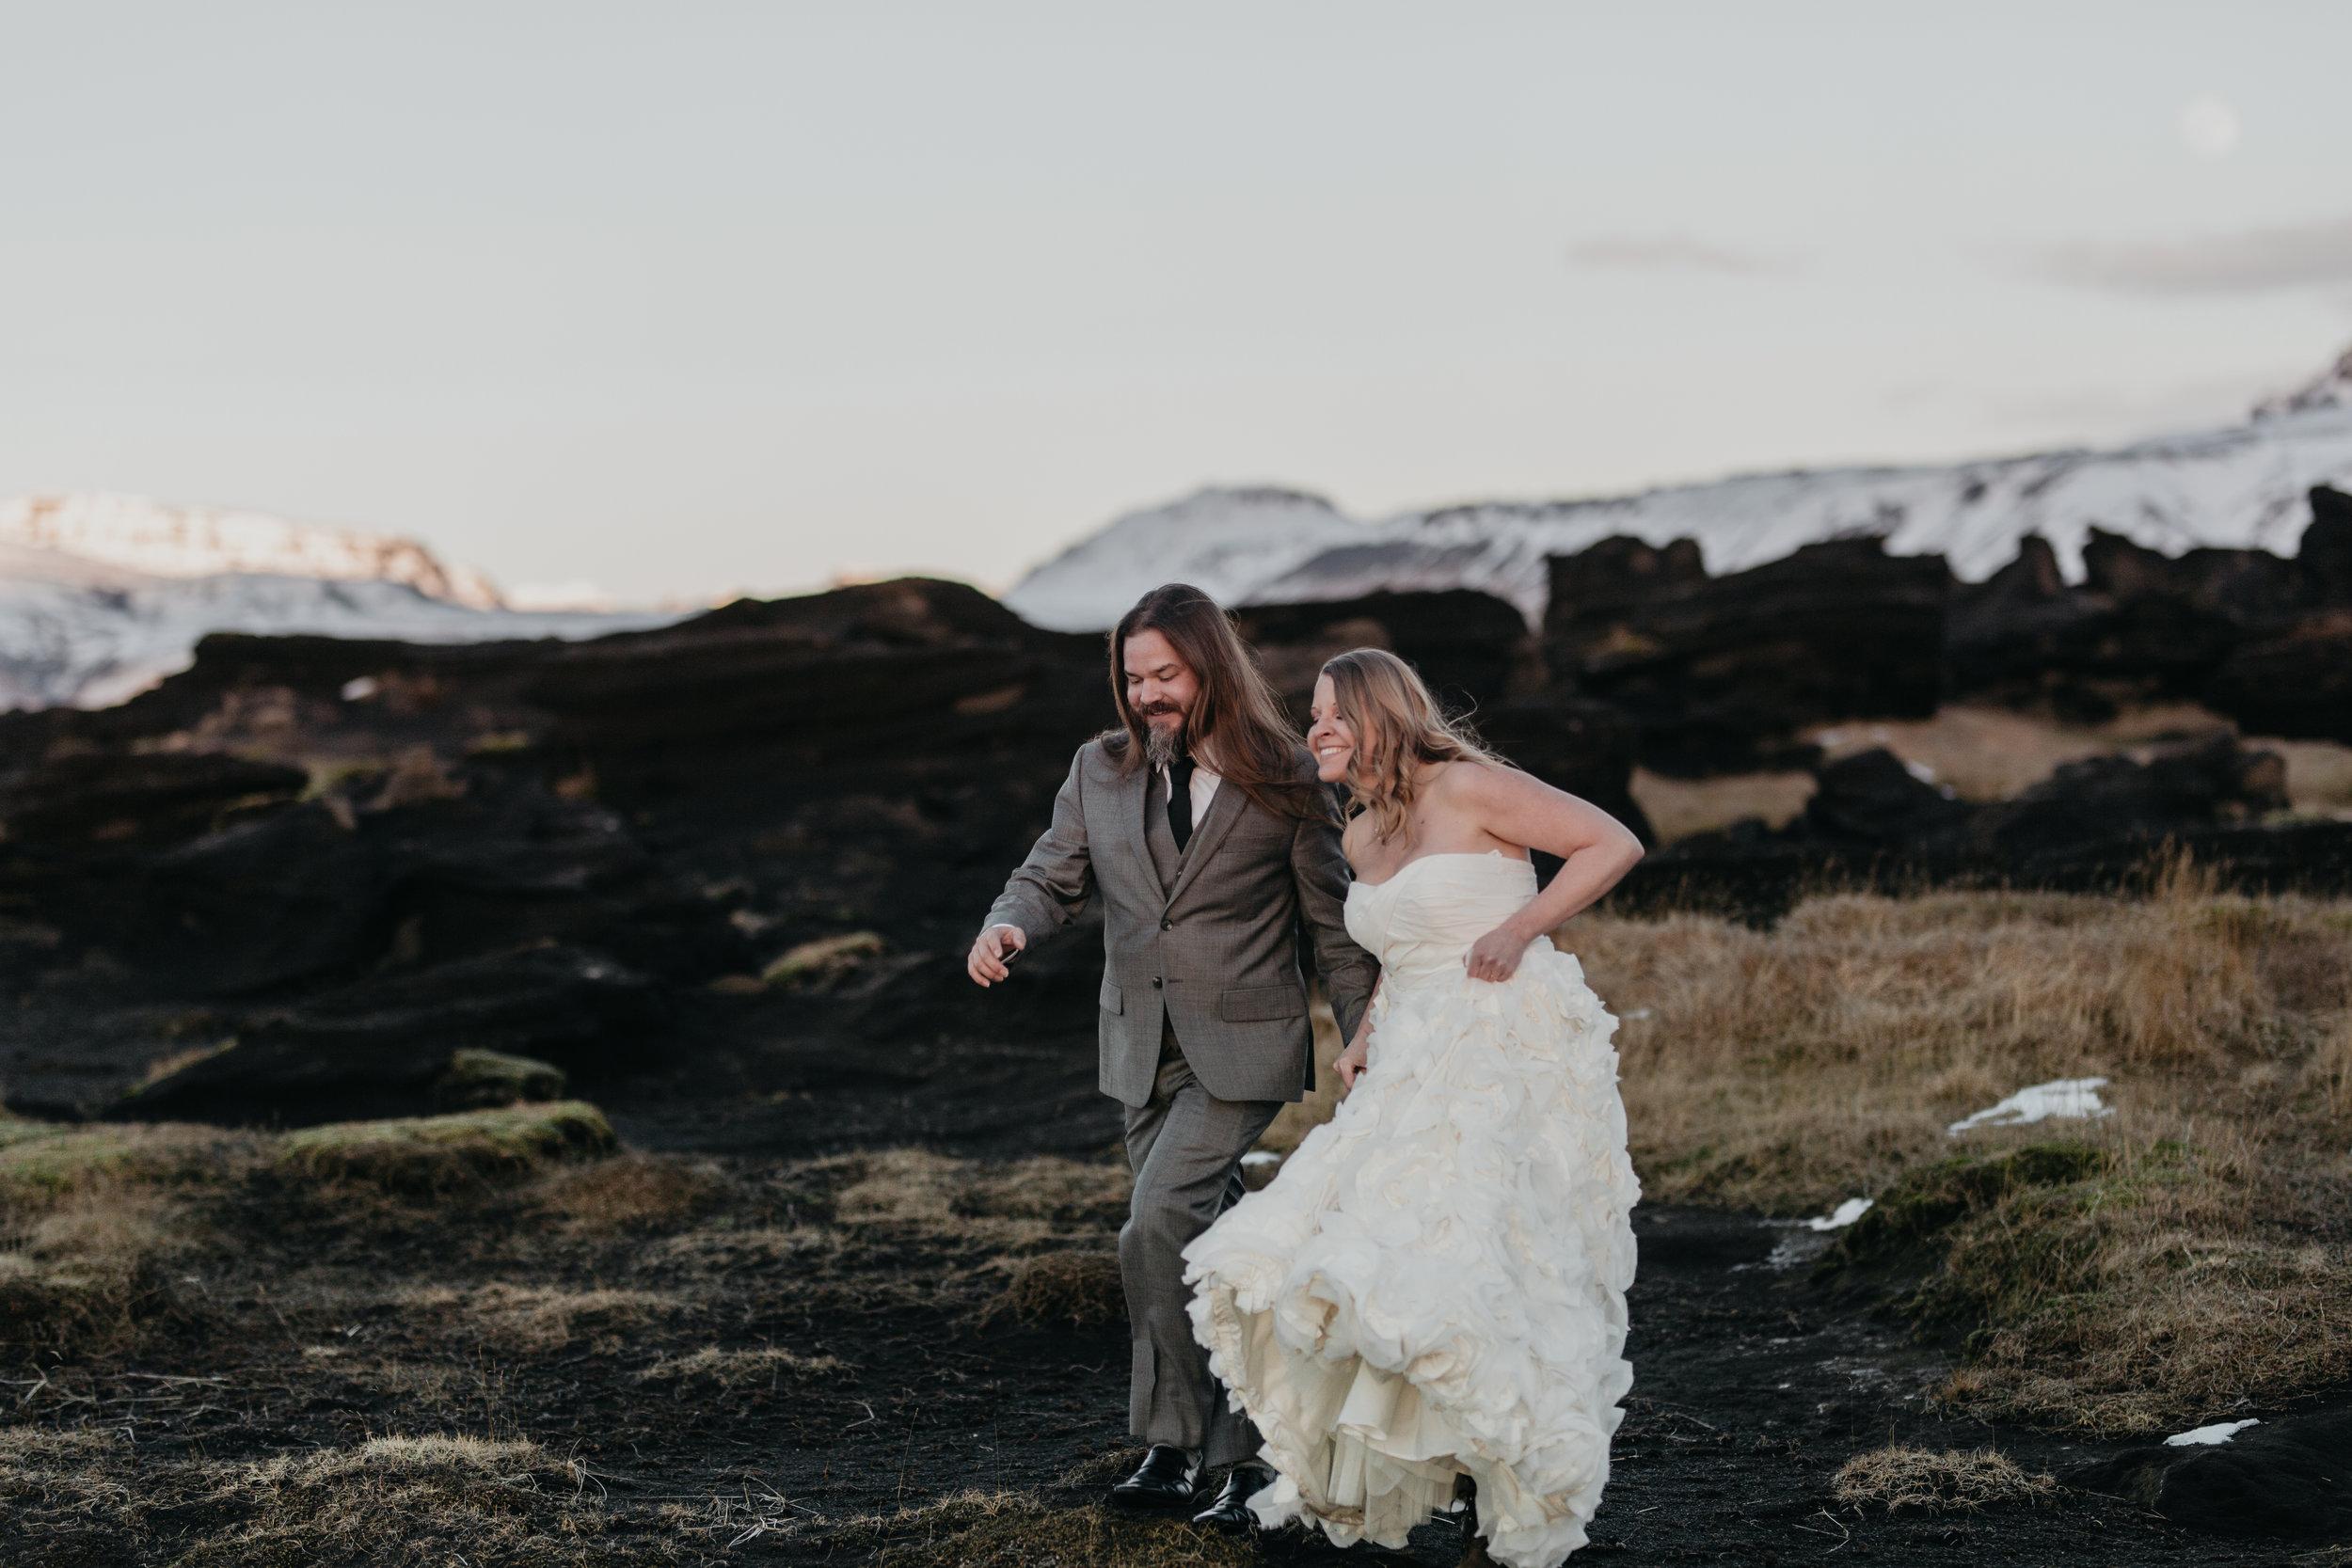 nicole-daacke-photography-iceland-winter-sunset-adventure-elopement-skogafoss-waterfall-black-sand-beach-dyrholaey-vik-iceland-intimate-wedding-black-church-elopement-photographer-28.jpg